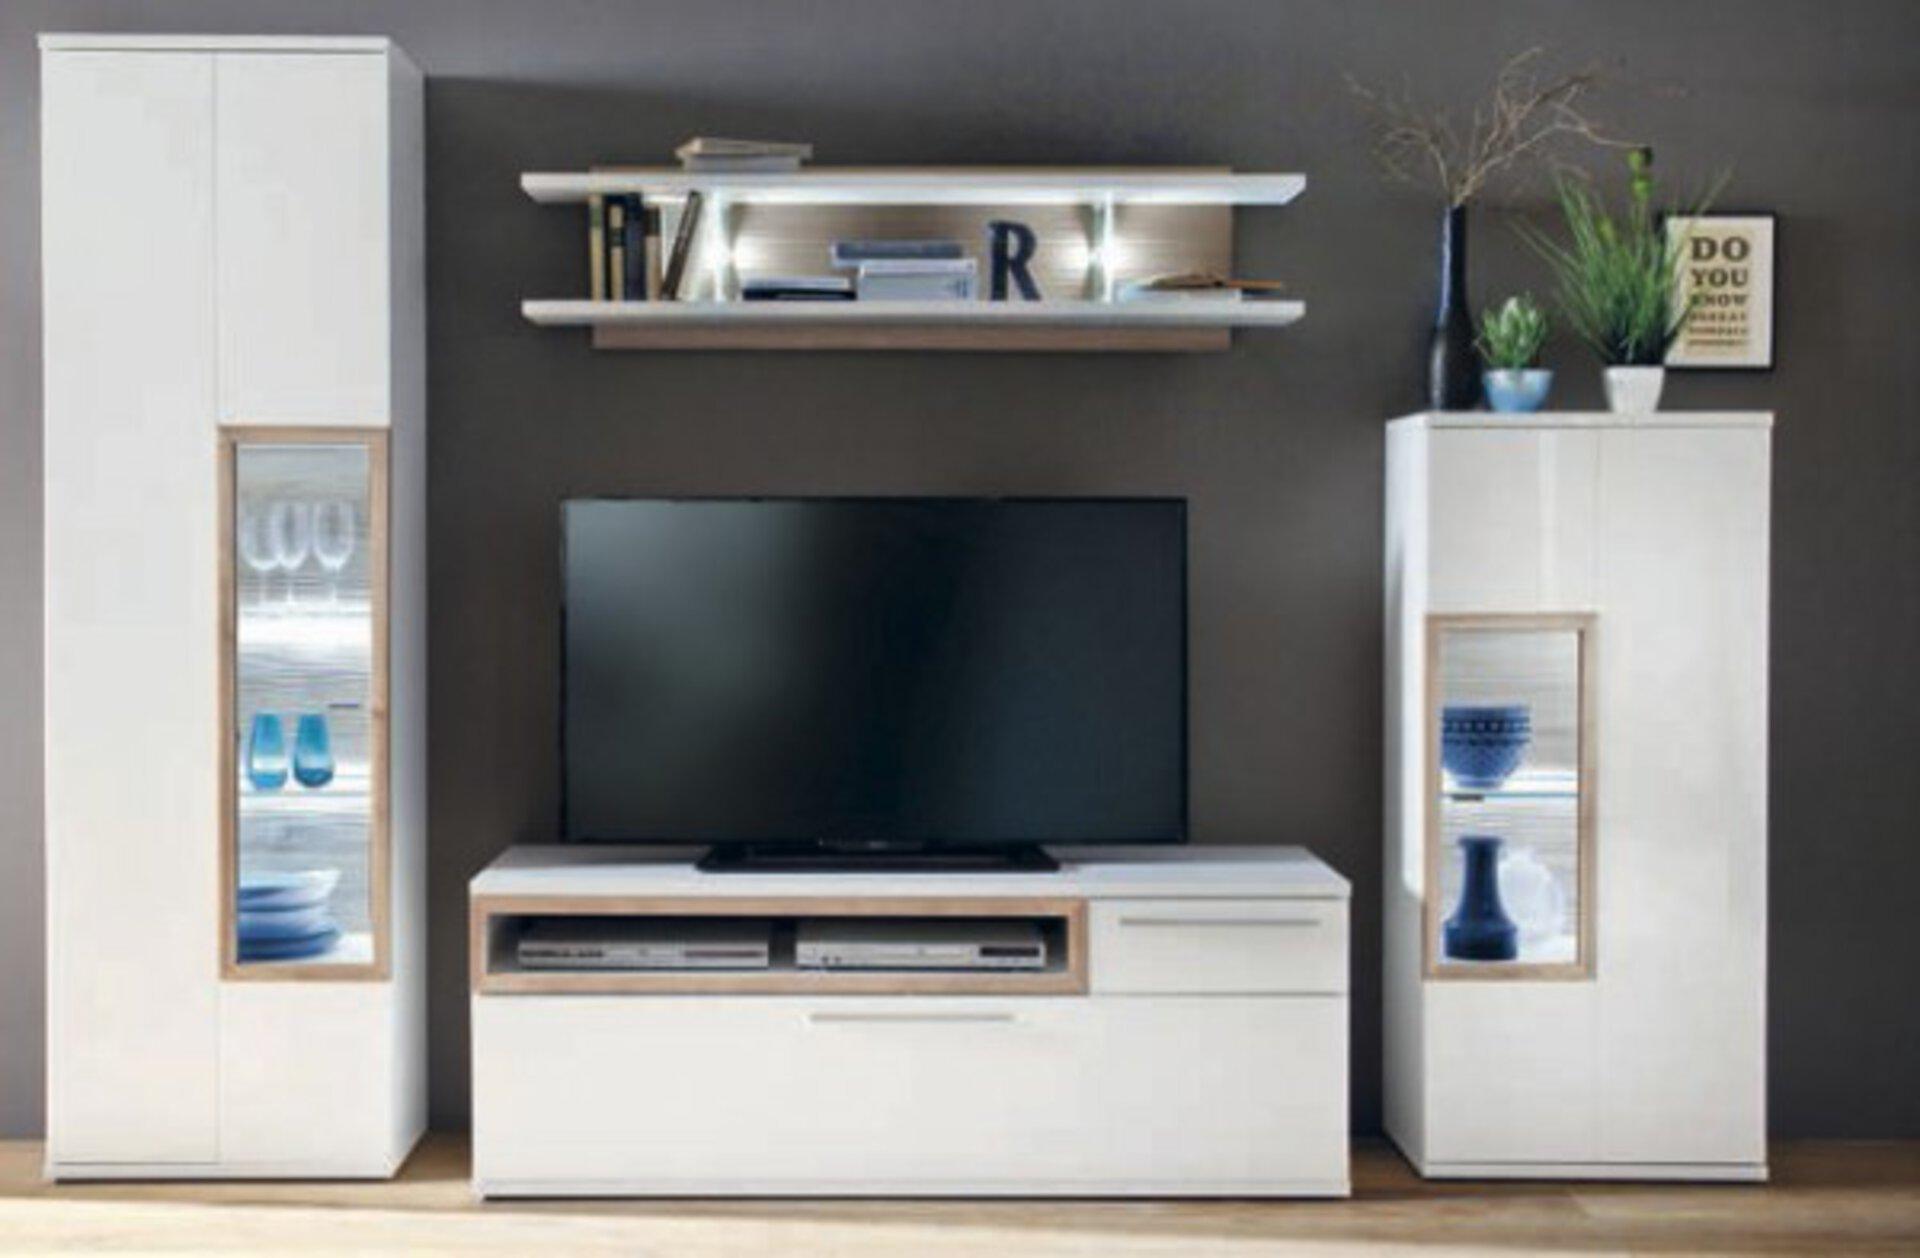 Wohnwand PAMPLONA MCA furniture 1 x 2 x 3 cm